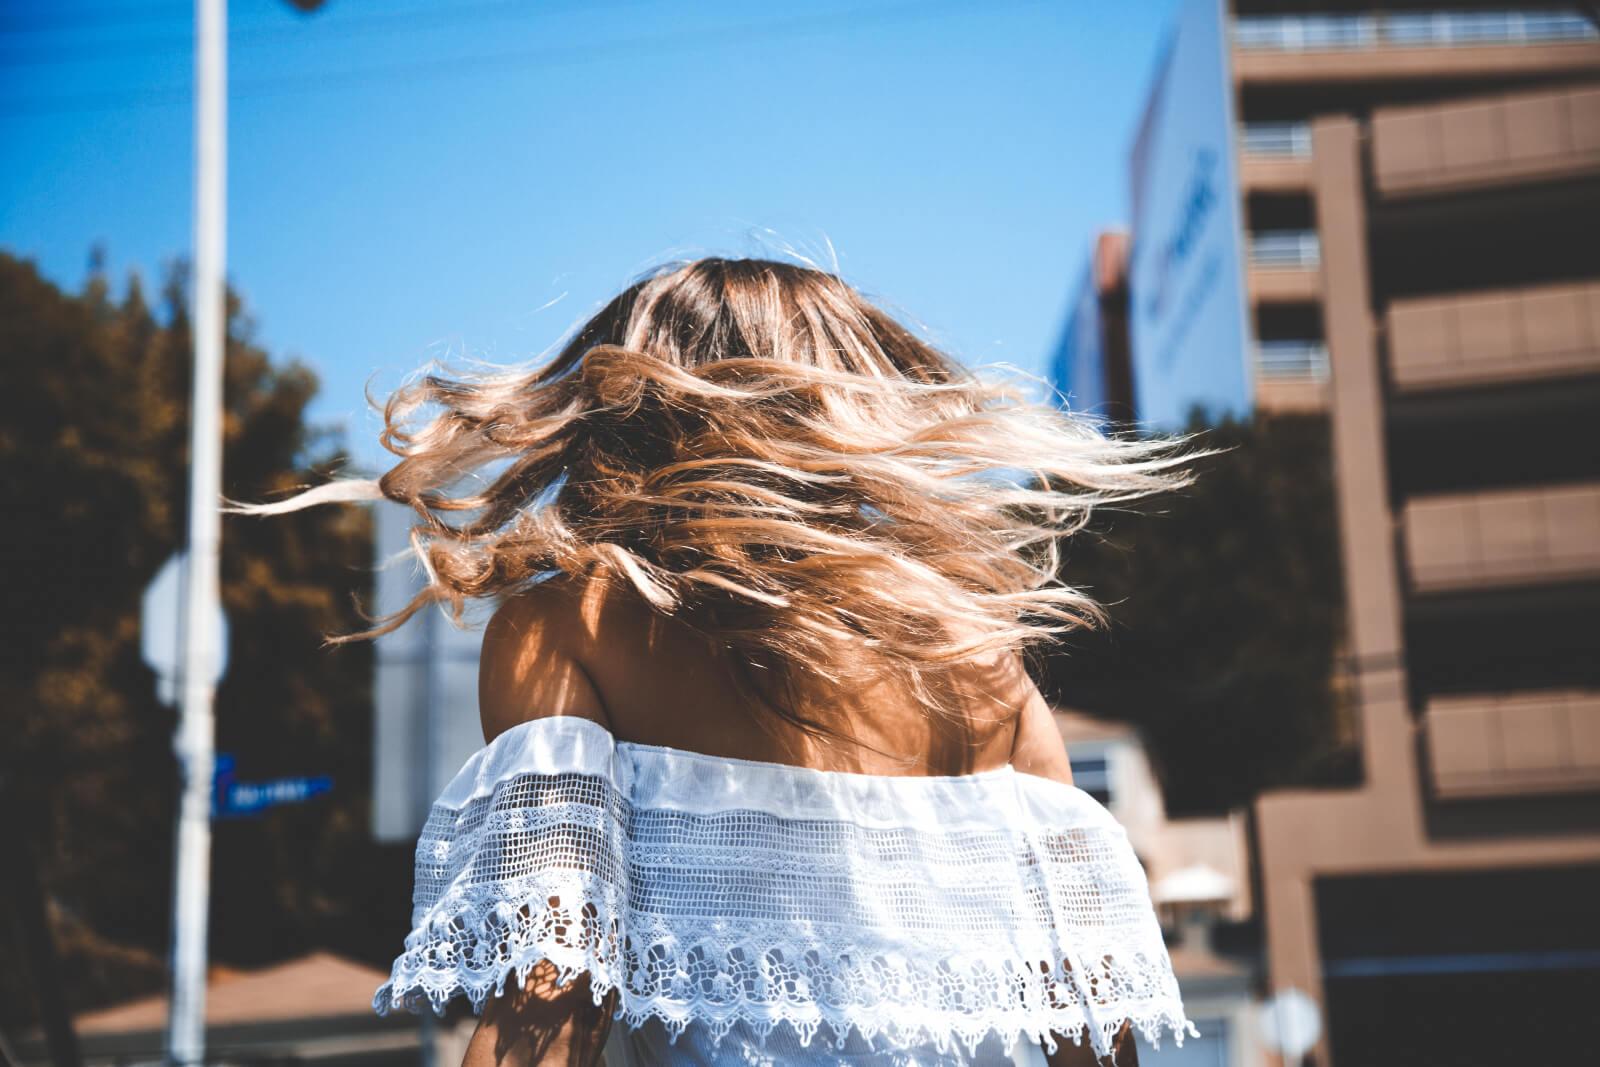 davines-hair-products-abloomnova.net_-1600x1067 Go blonder with Davines Hair Products